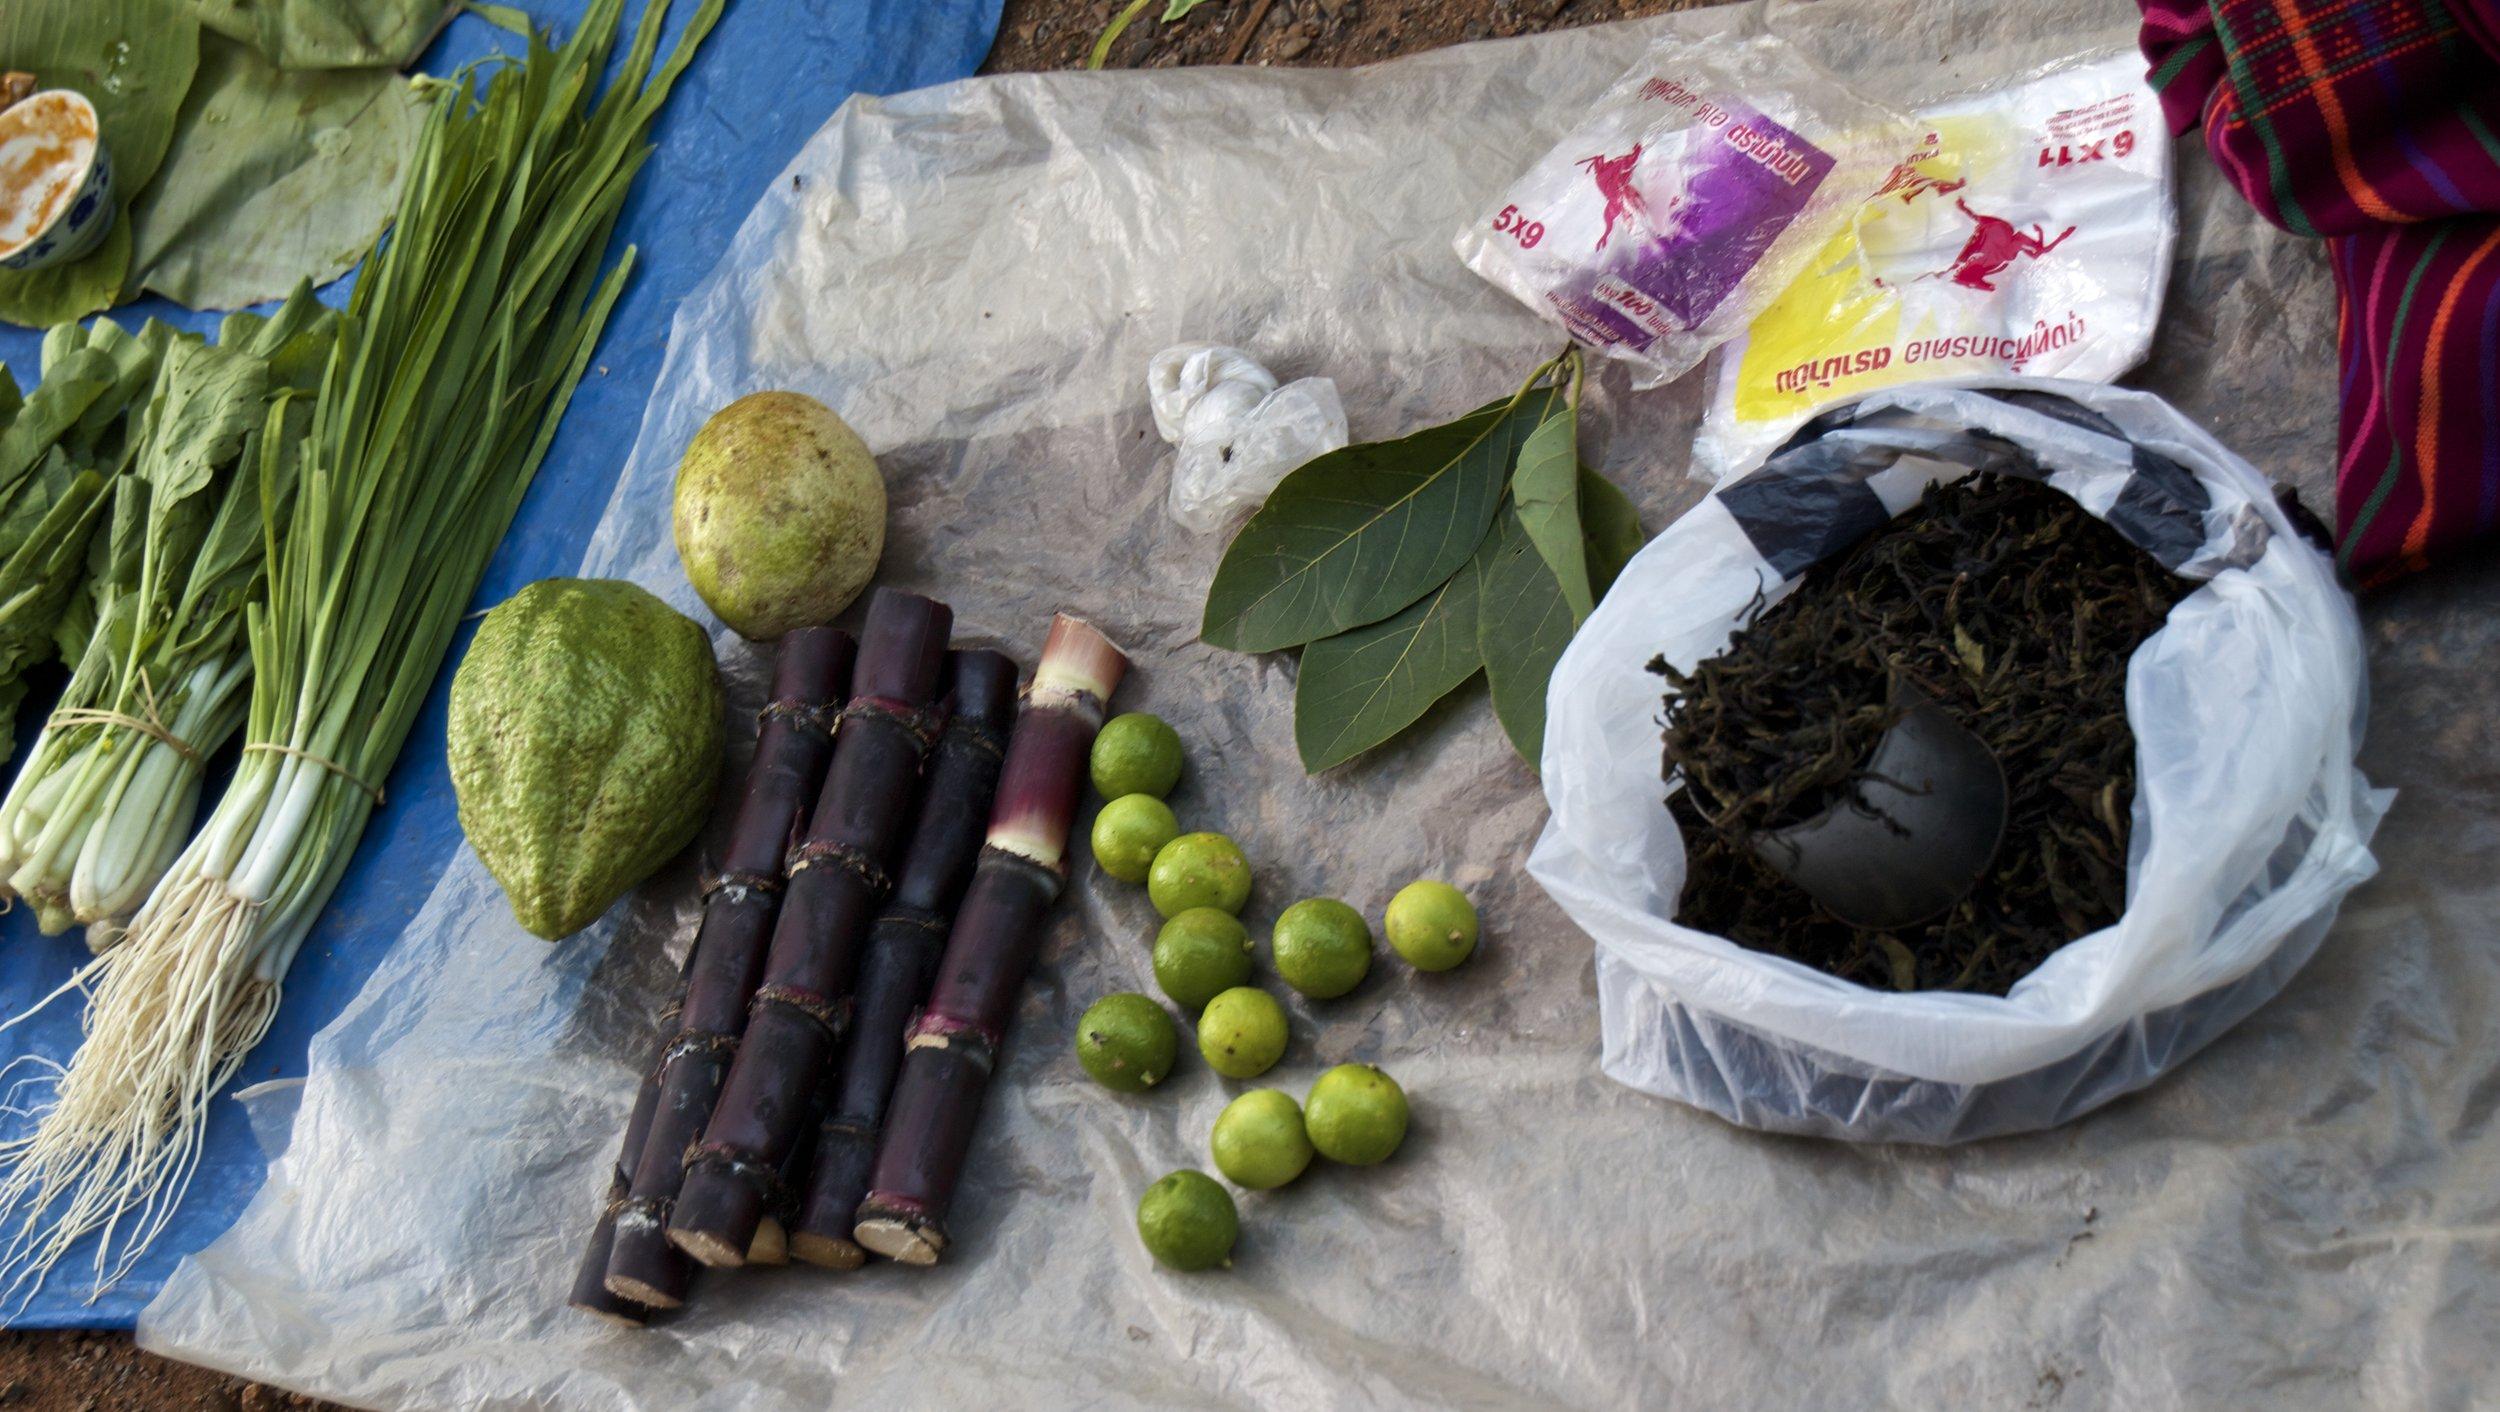 pa'o people market shan state burma myanmar 8.jpg